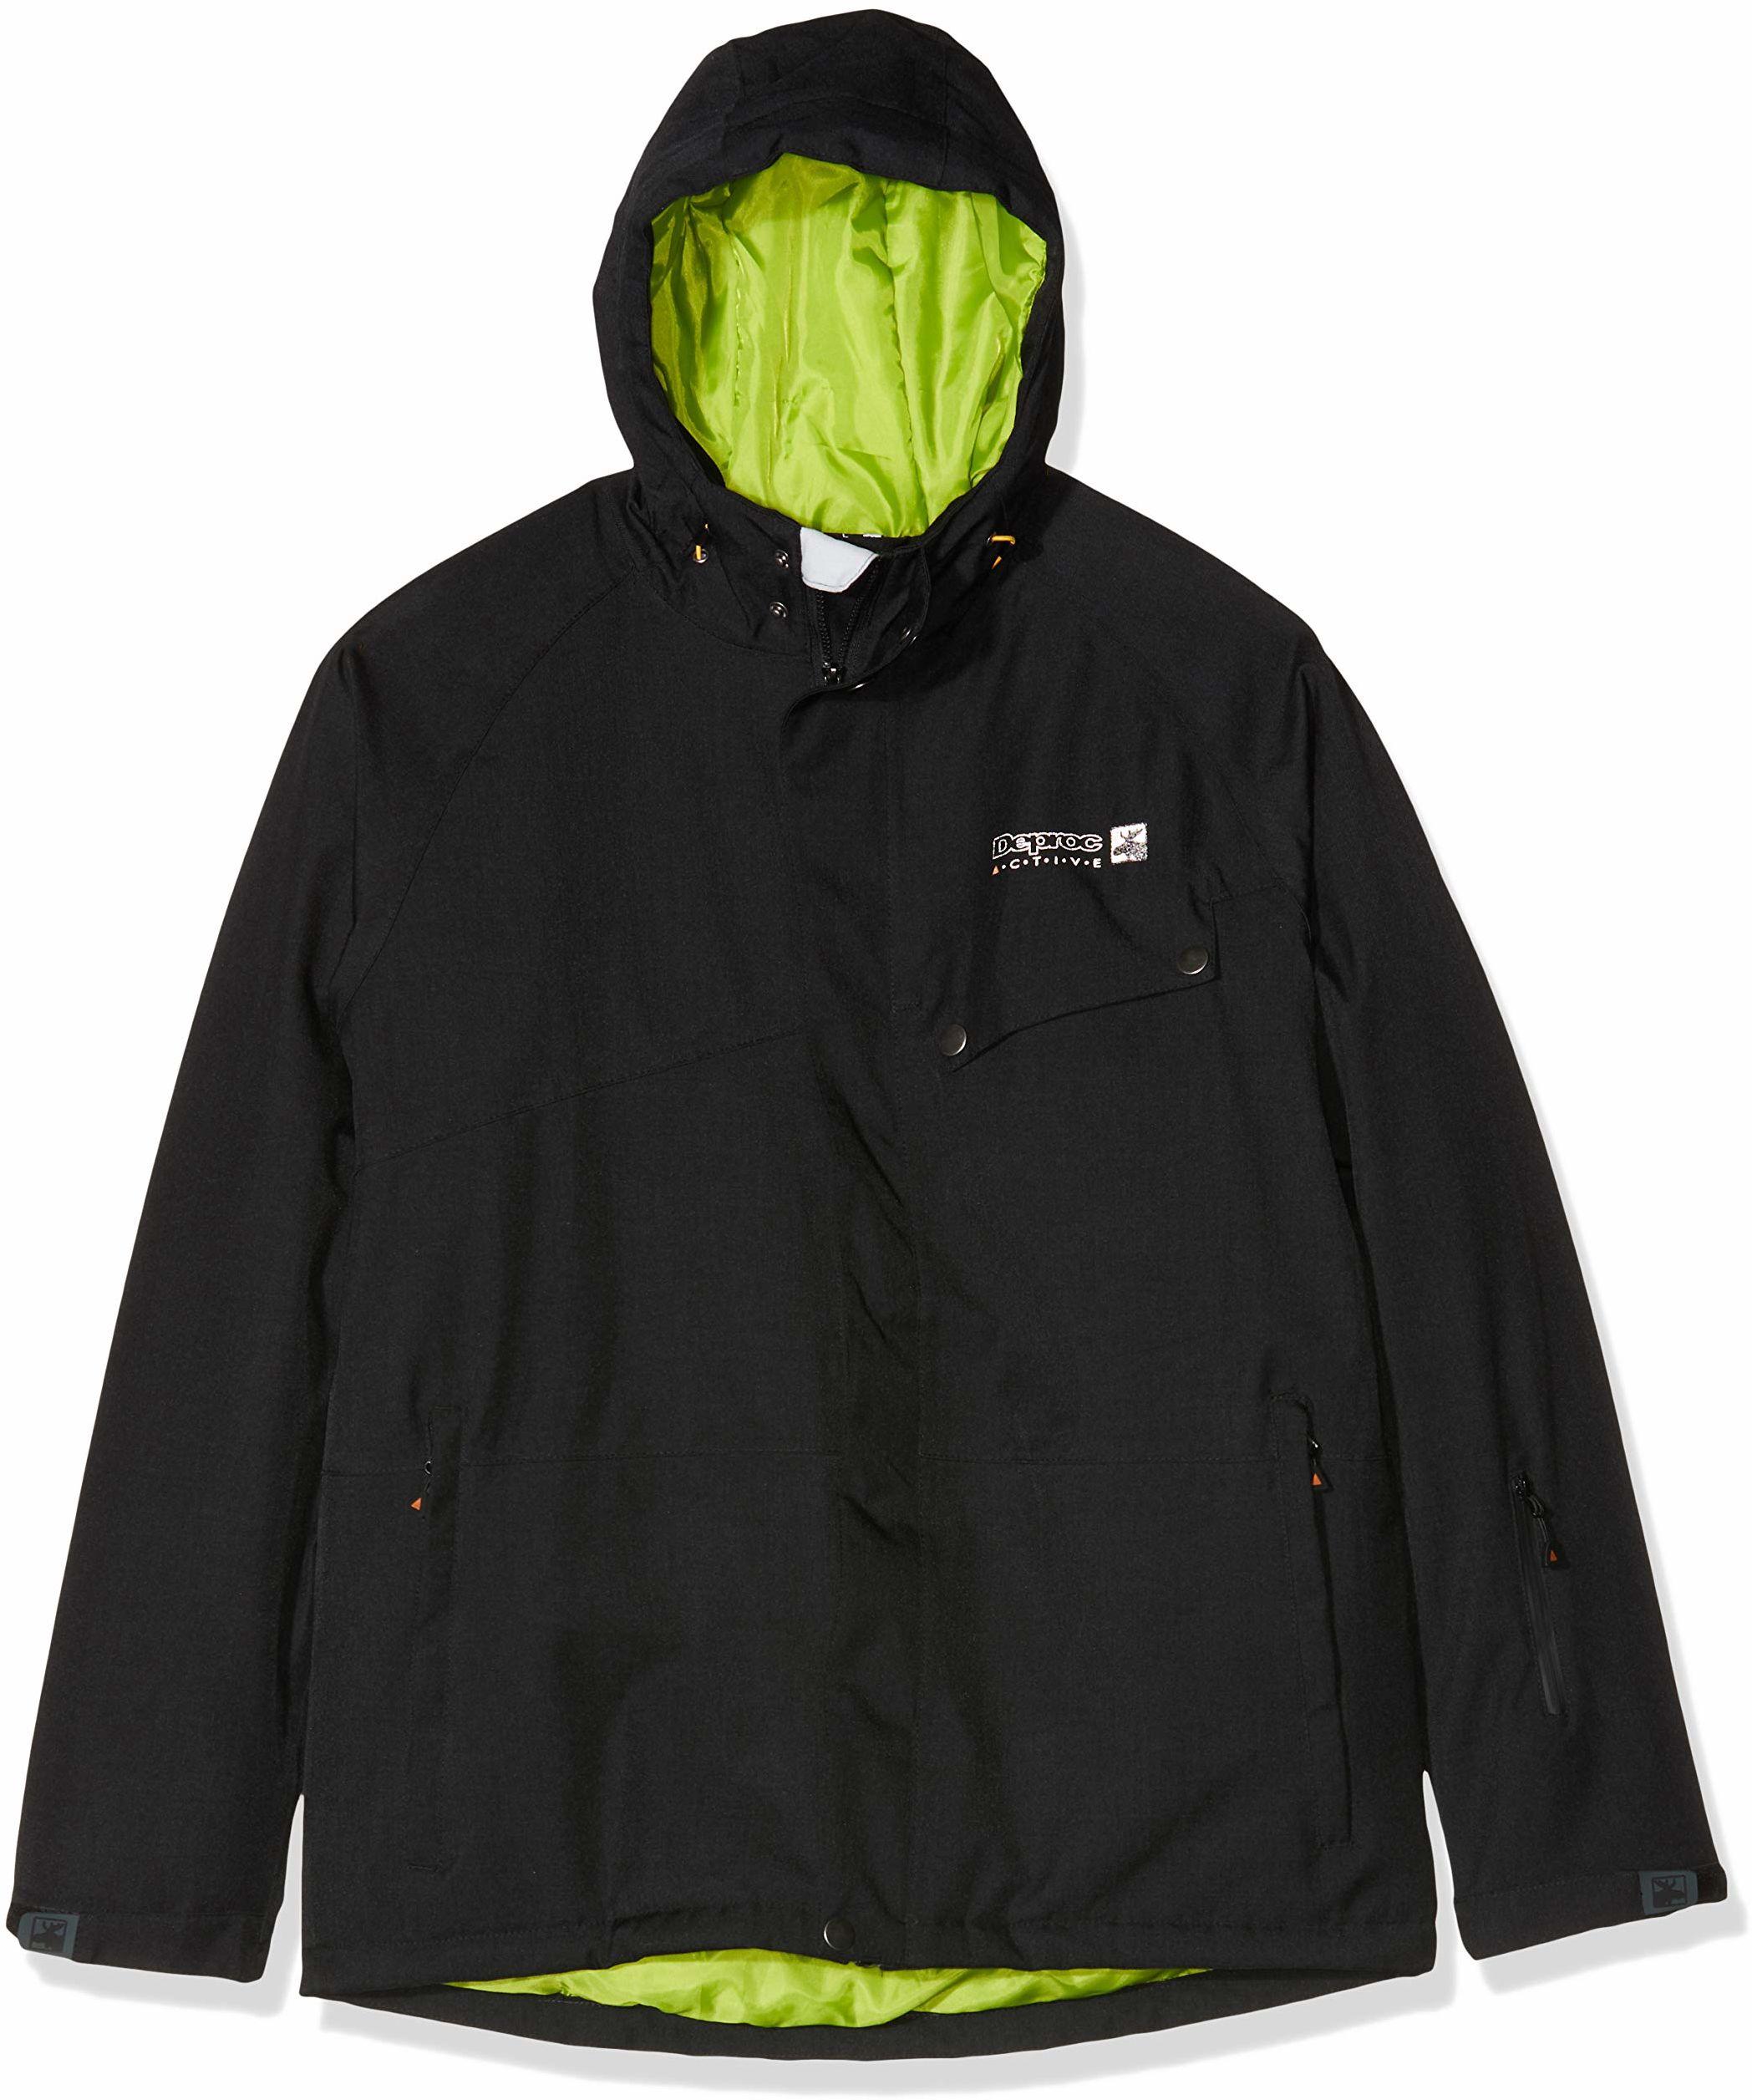 DEPROC-Active Alaska męska kurtka narciarska czarny czarny 5XL